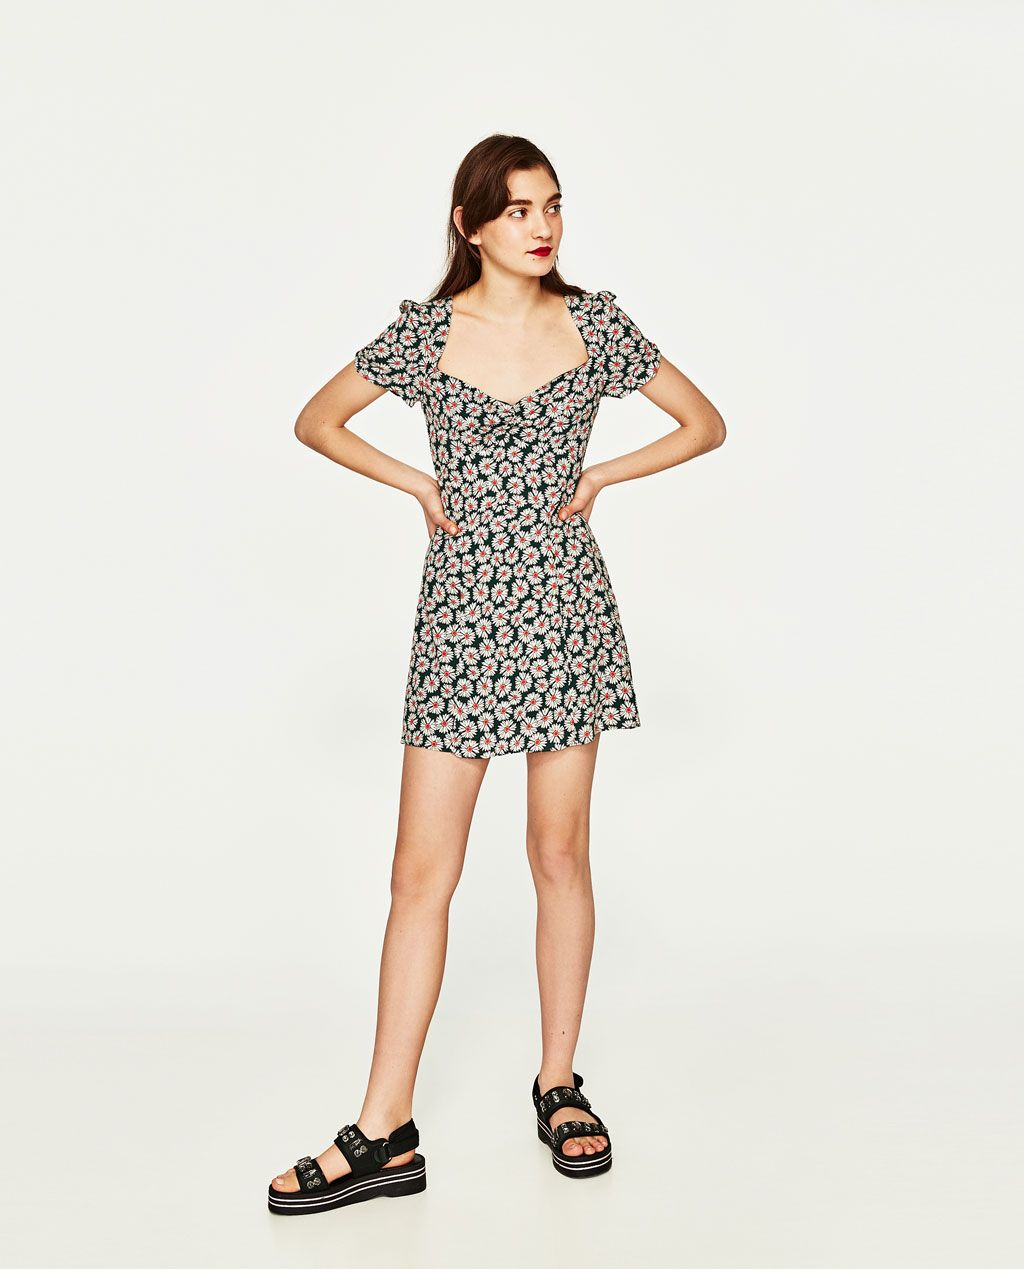 Daisies Dress With Sweetheart Neckline Dresses Woman Zara United States Dresses Women Sweetheart Neckline Dress [ 1269 x 1024 Pixel ]